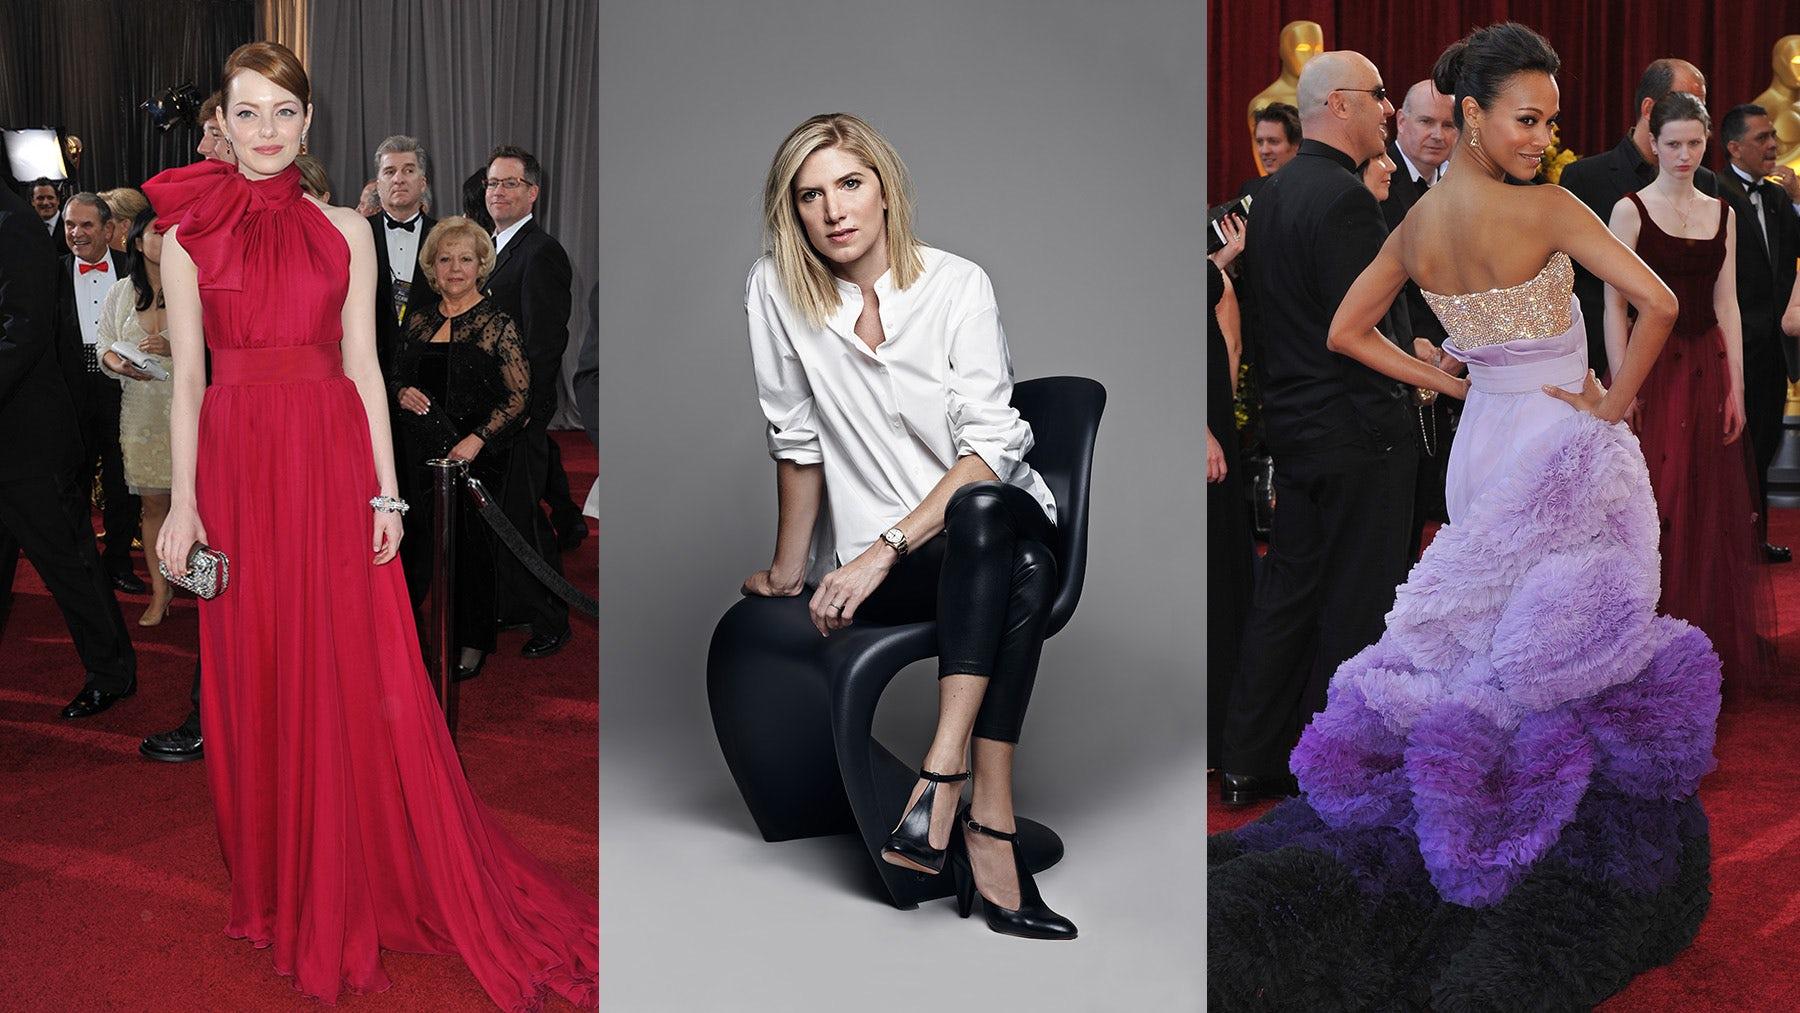 (L) Emma Stone in Giambattista Valli; (R) Zoe Saldana in Givenchy Couture, (C) Petra Flannery | Source: (L&R) Shutterstock, (C) Naj Jamaï